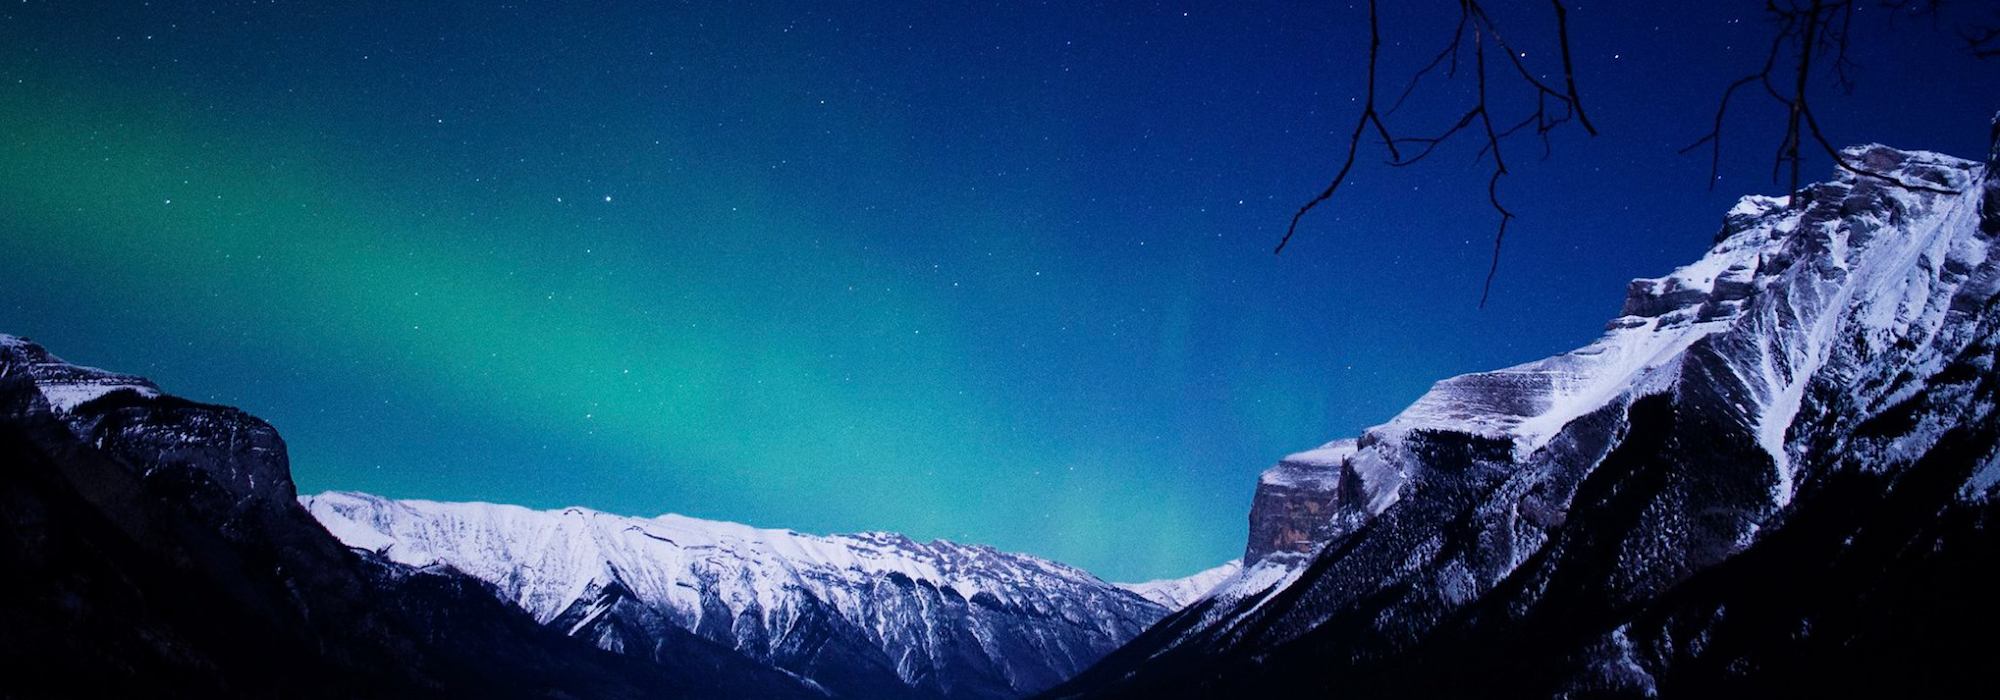 Aurora Borealis above Lake Minnewanka, Banff National Park.